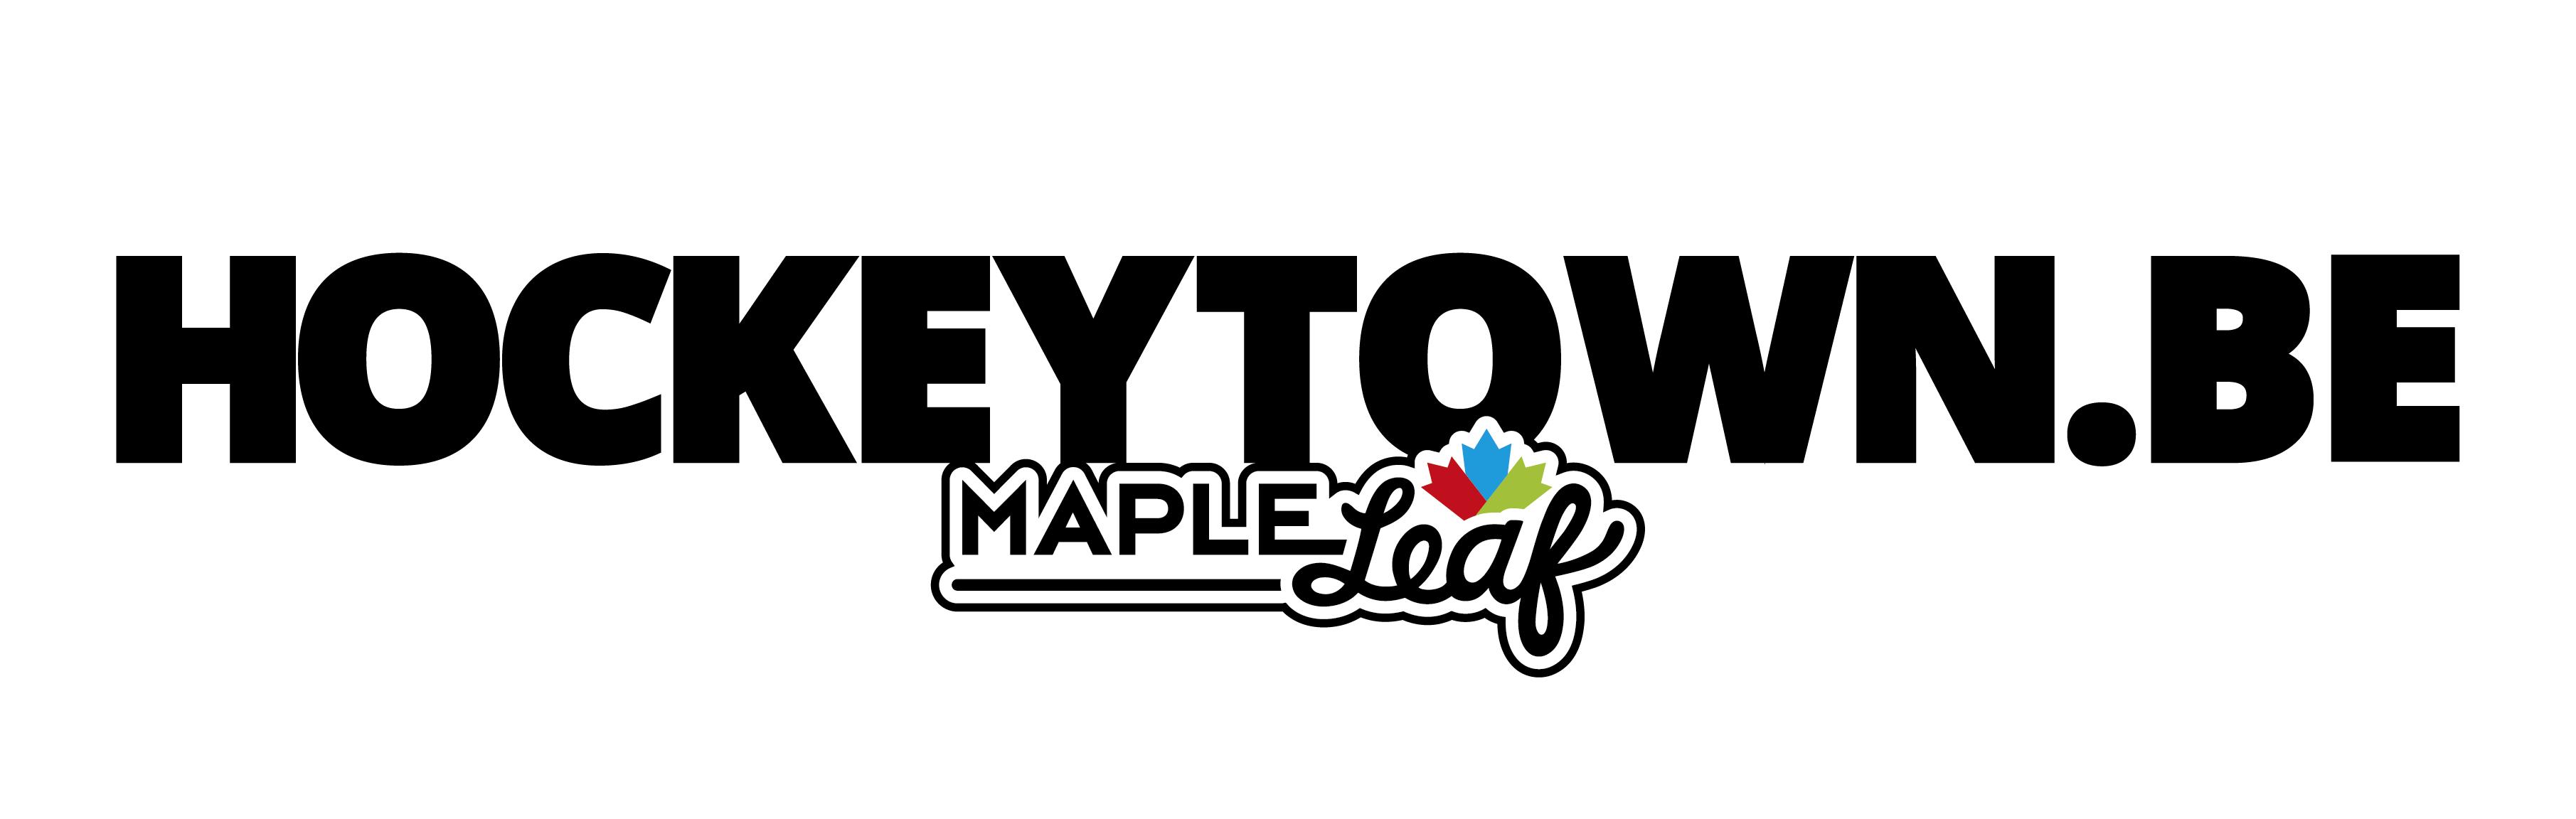 HOCKEYTOWN by Maple Leaf bis_Background white 5